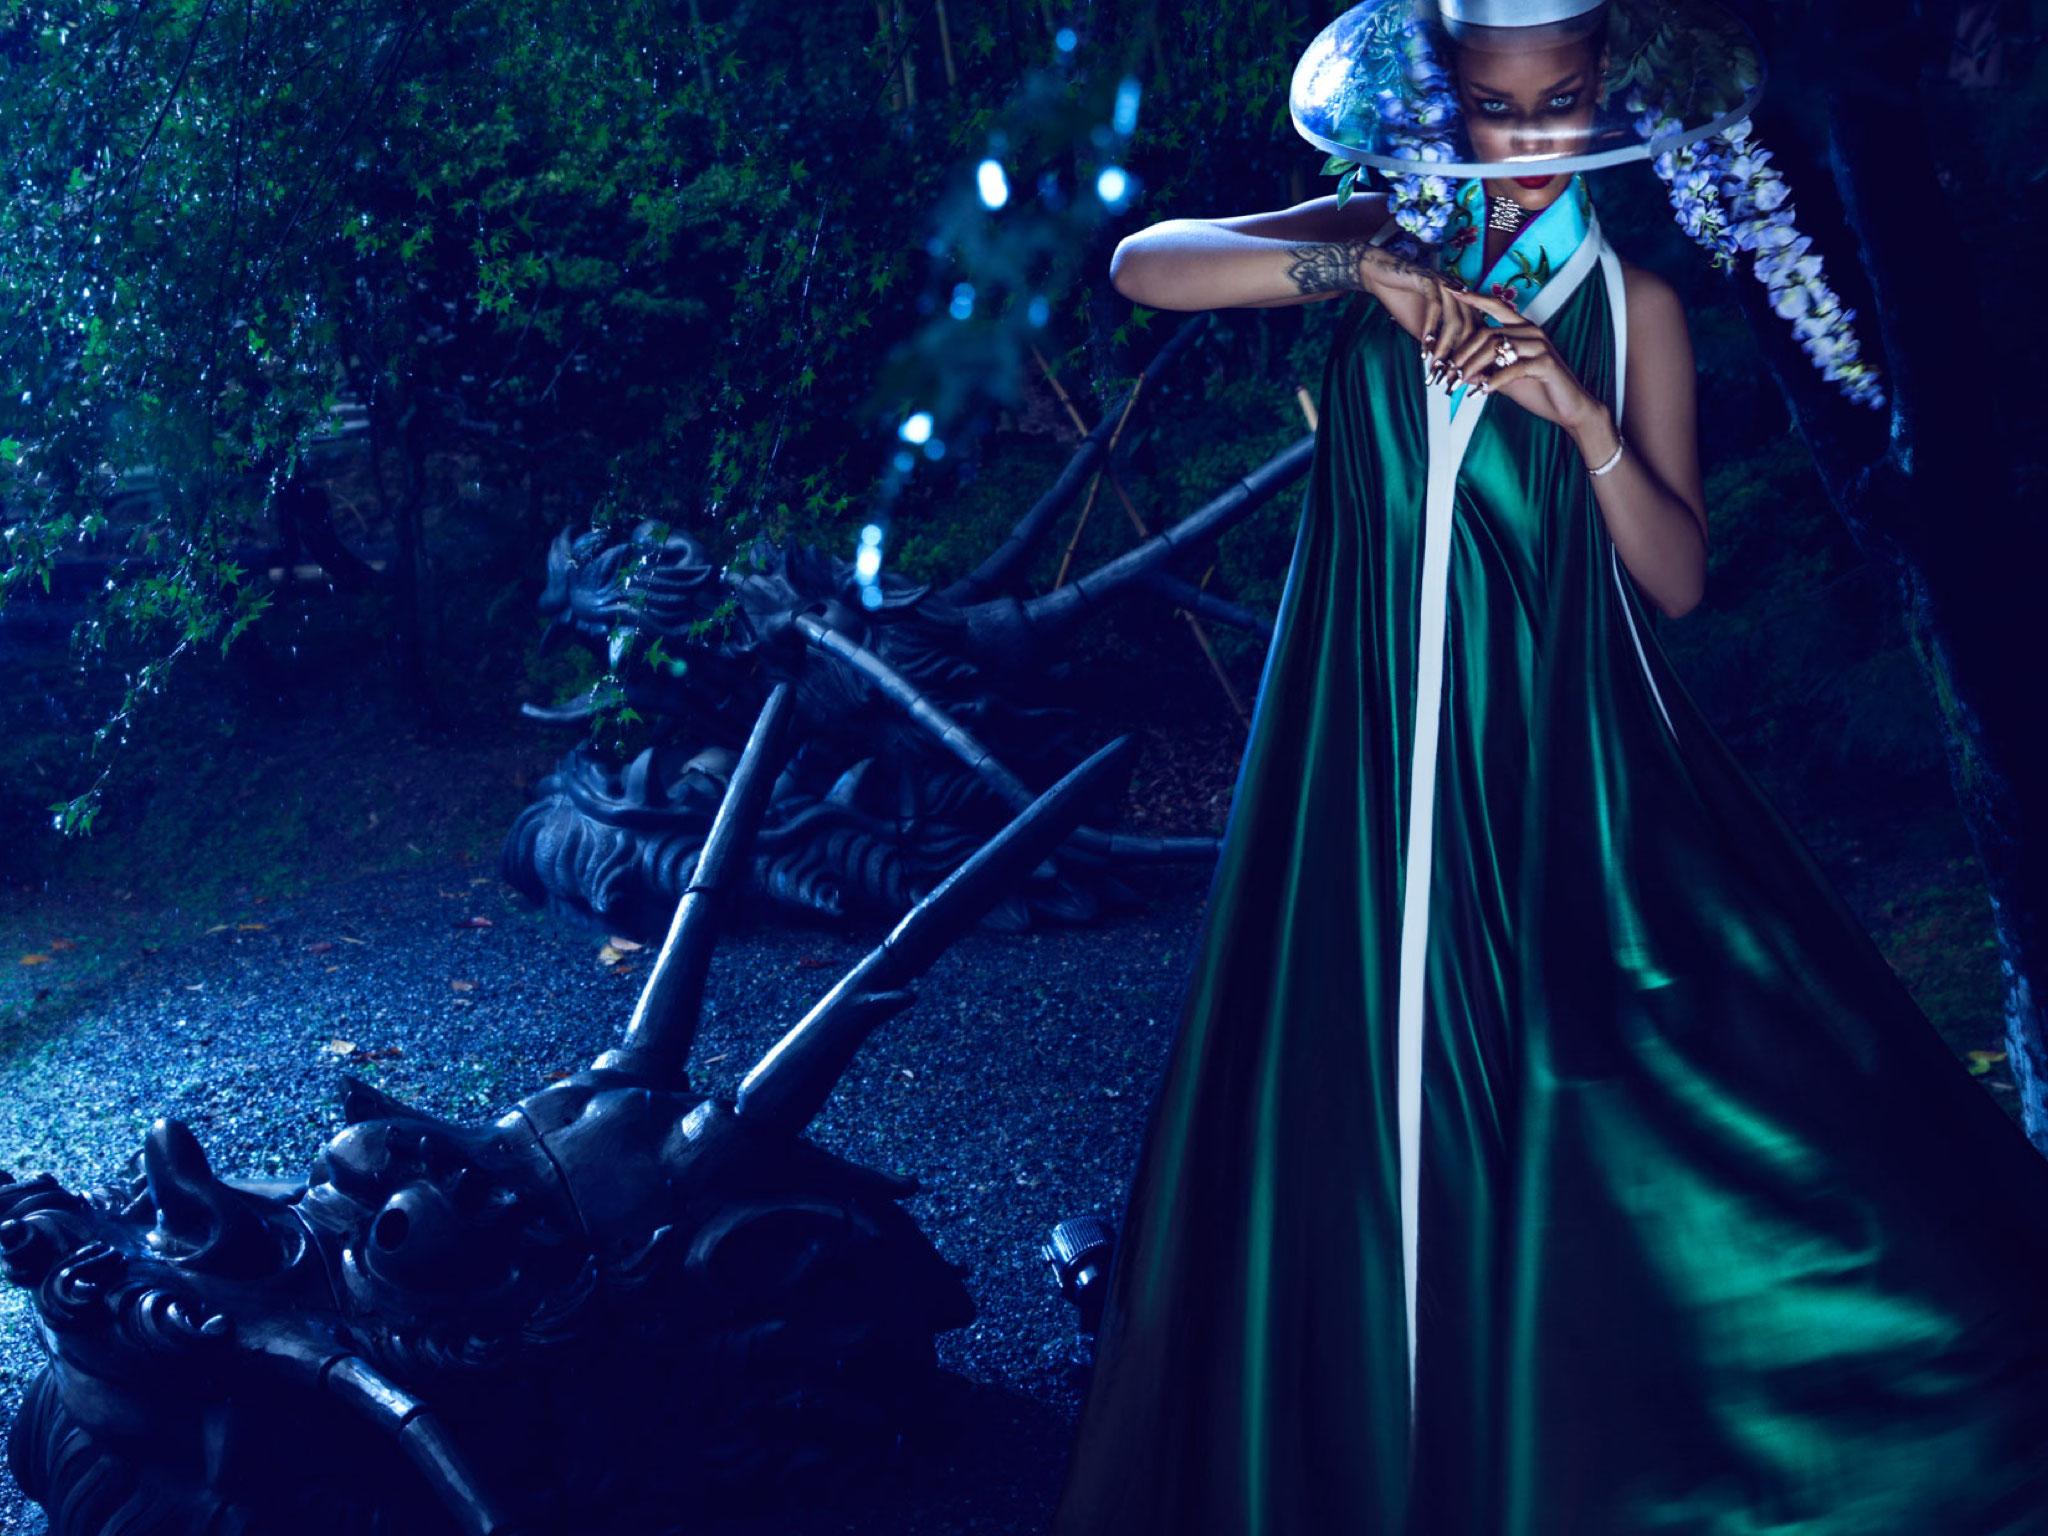 Rihanna in SS'15 'Wisteria Mysteria' for Harper's Bazaar China.